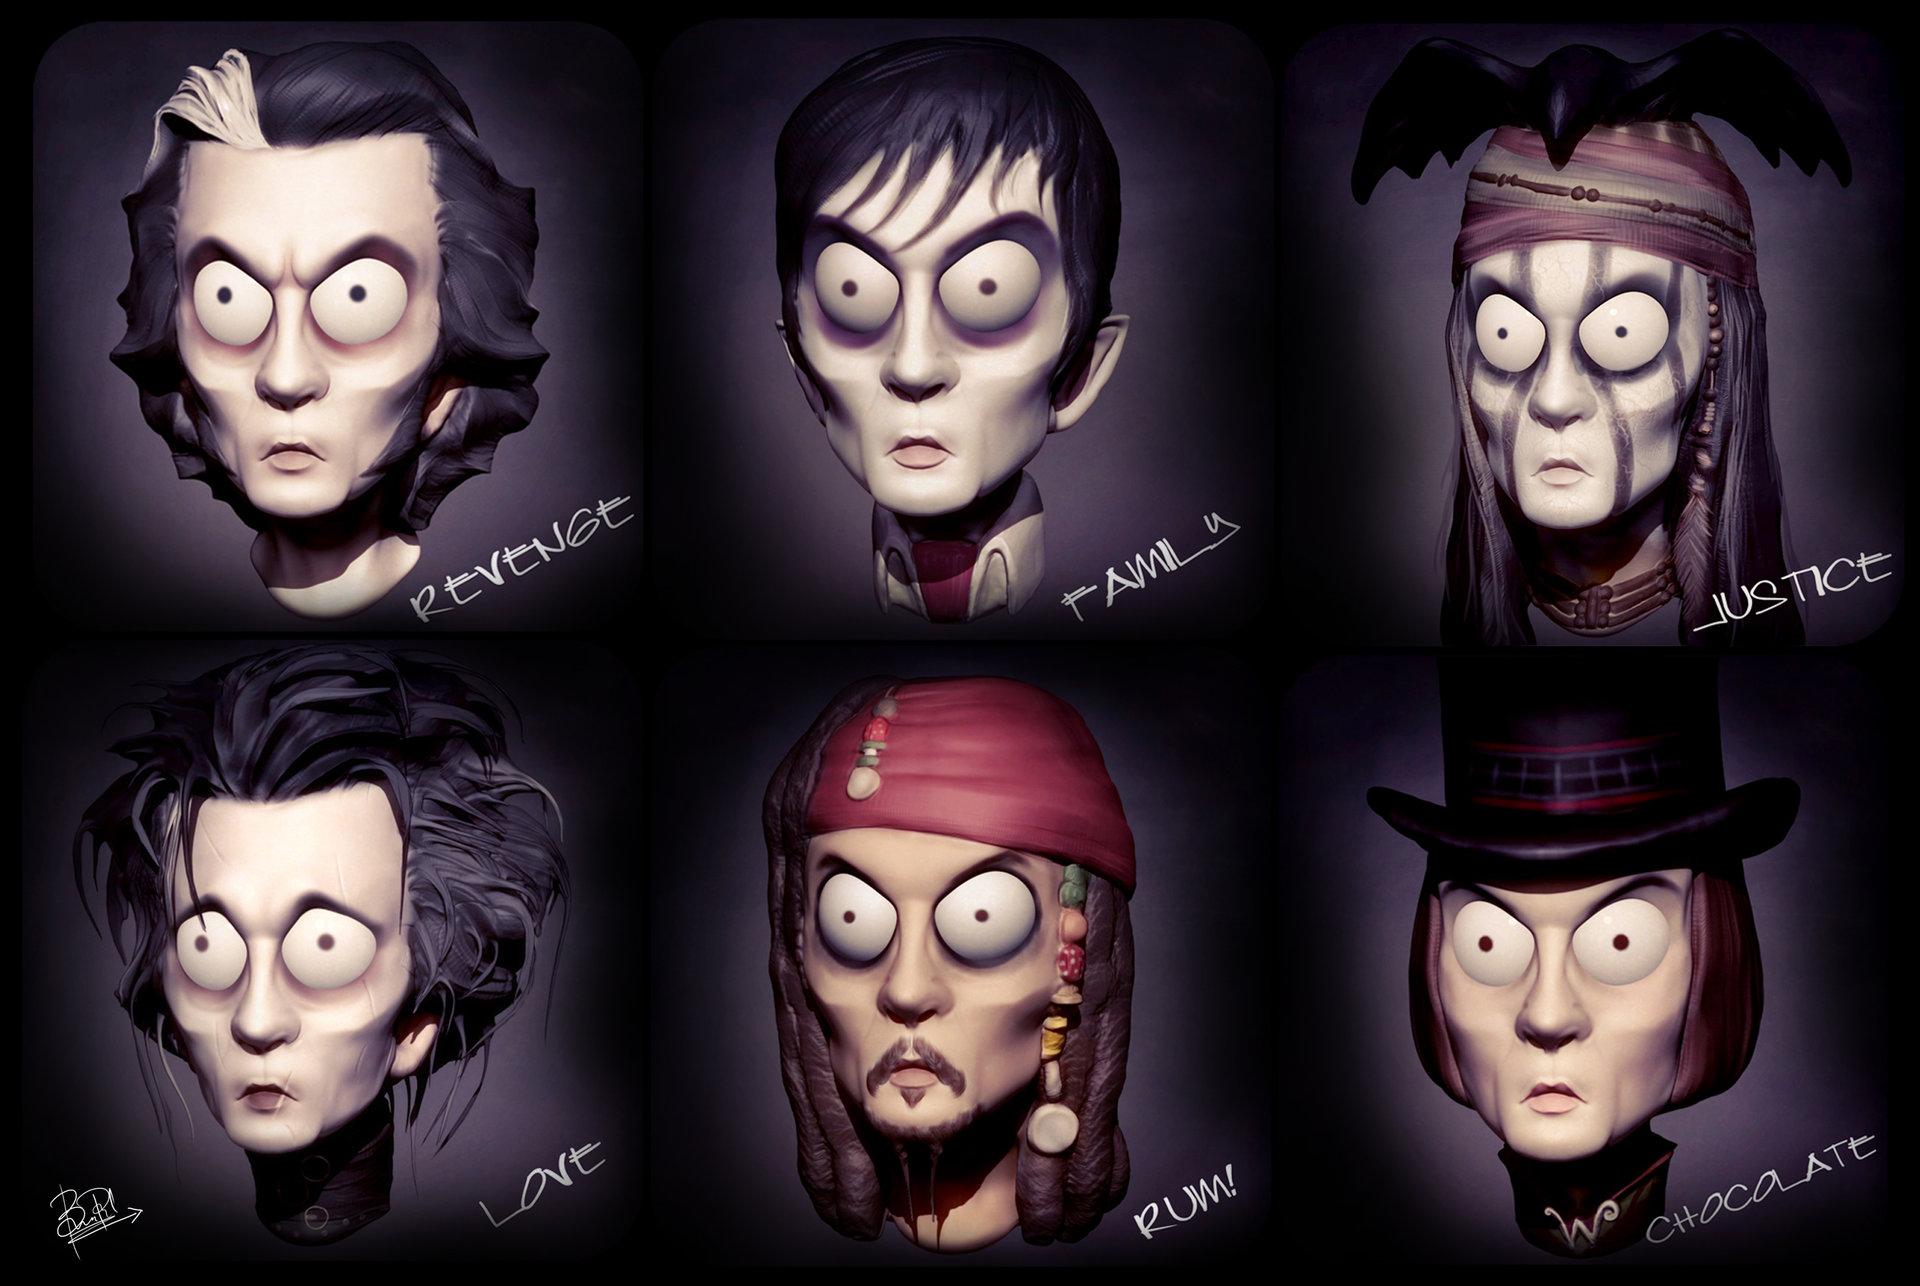 Artstation - Johnny Depp Characters Bhavesh Panchal